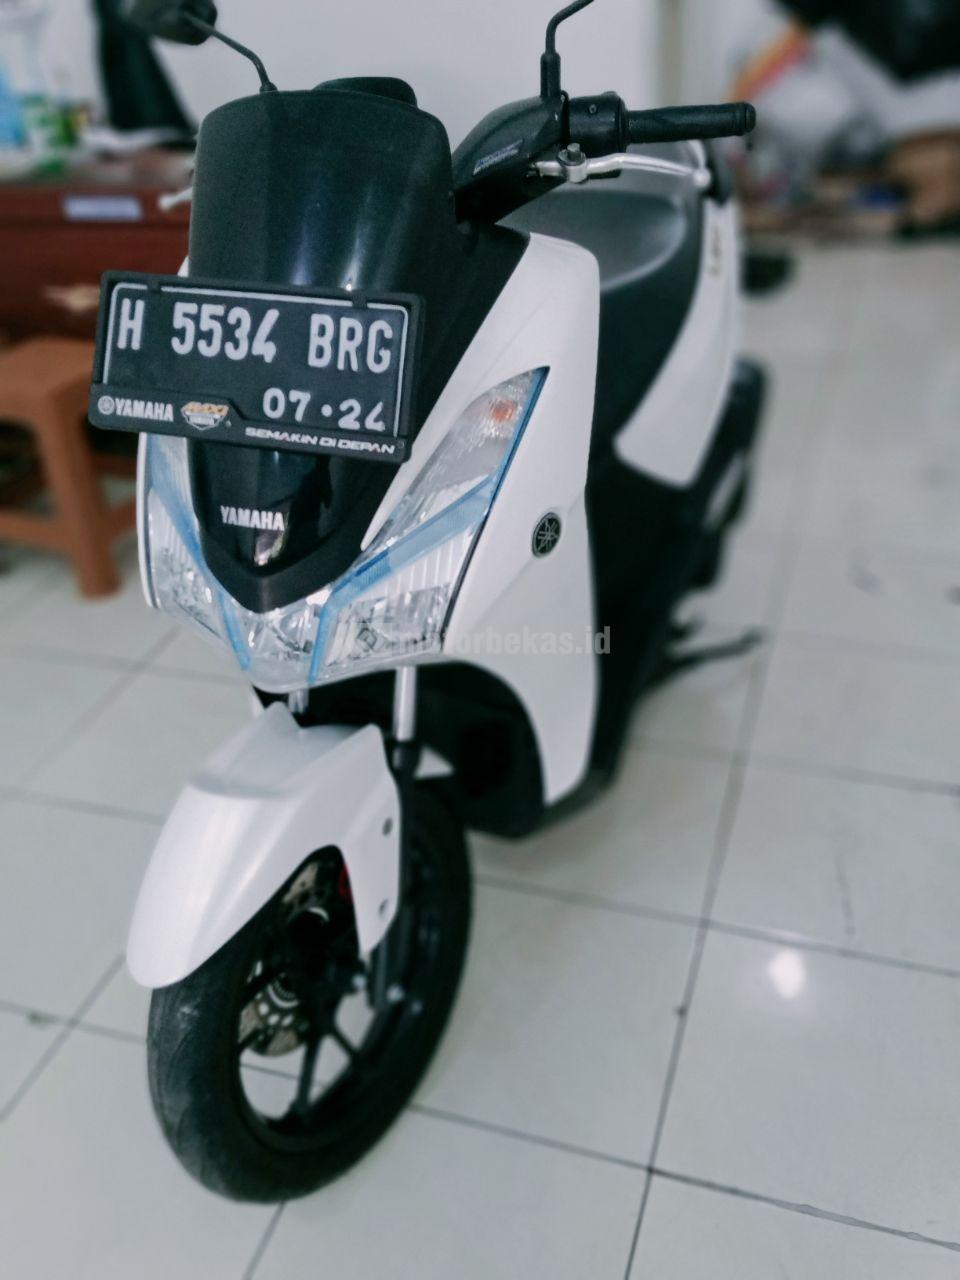 YAMAHA LEXI FI 953 motorbekas.id